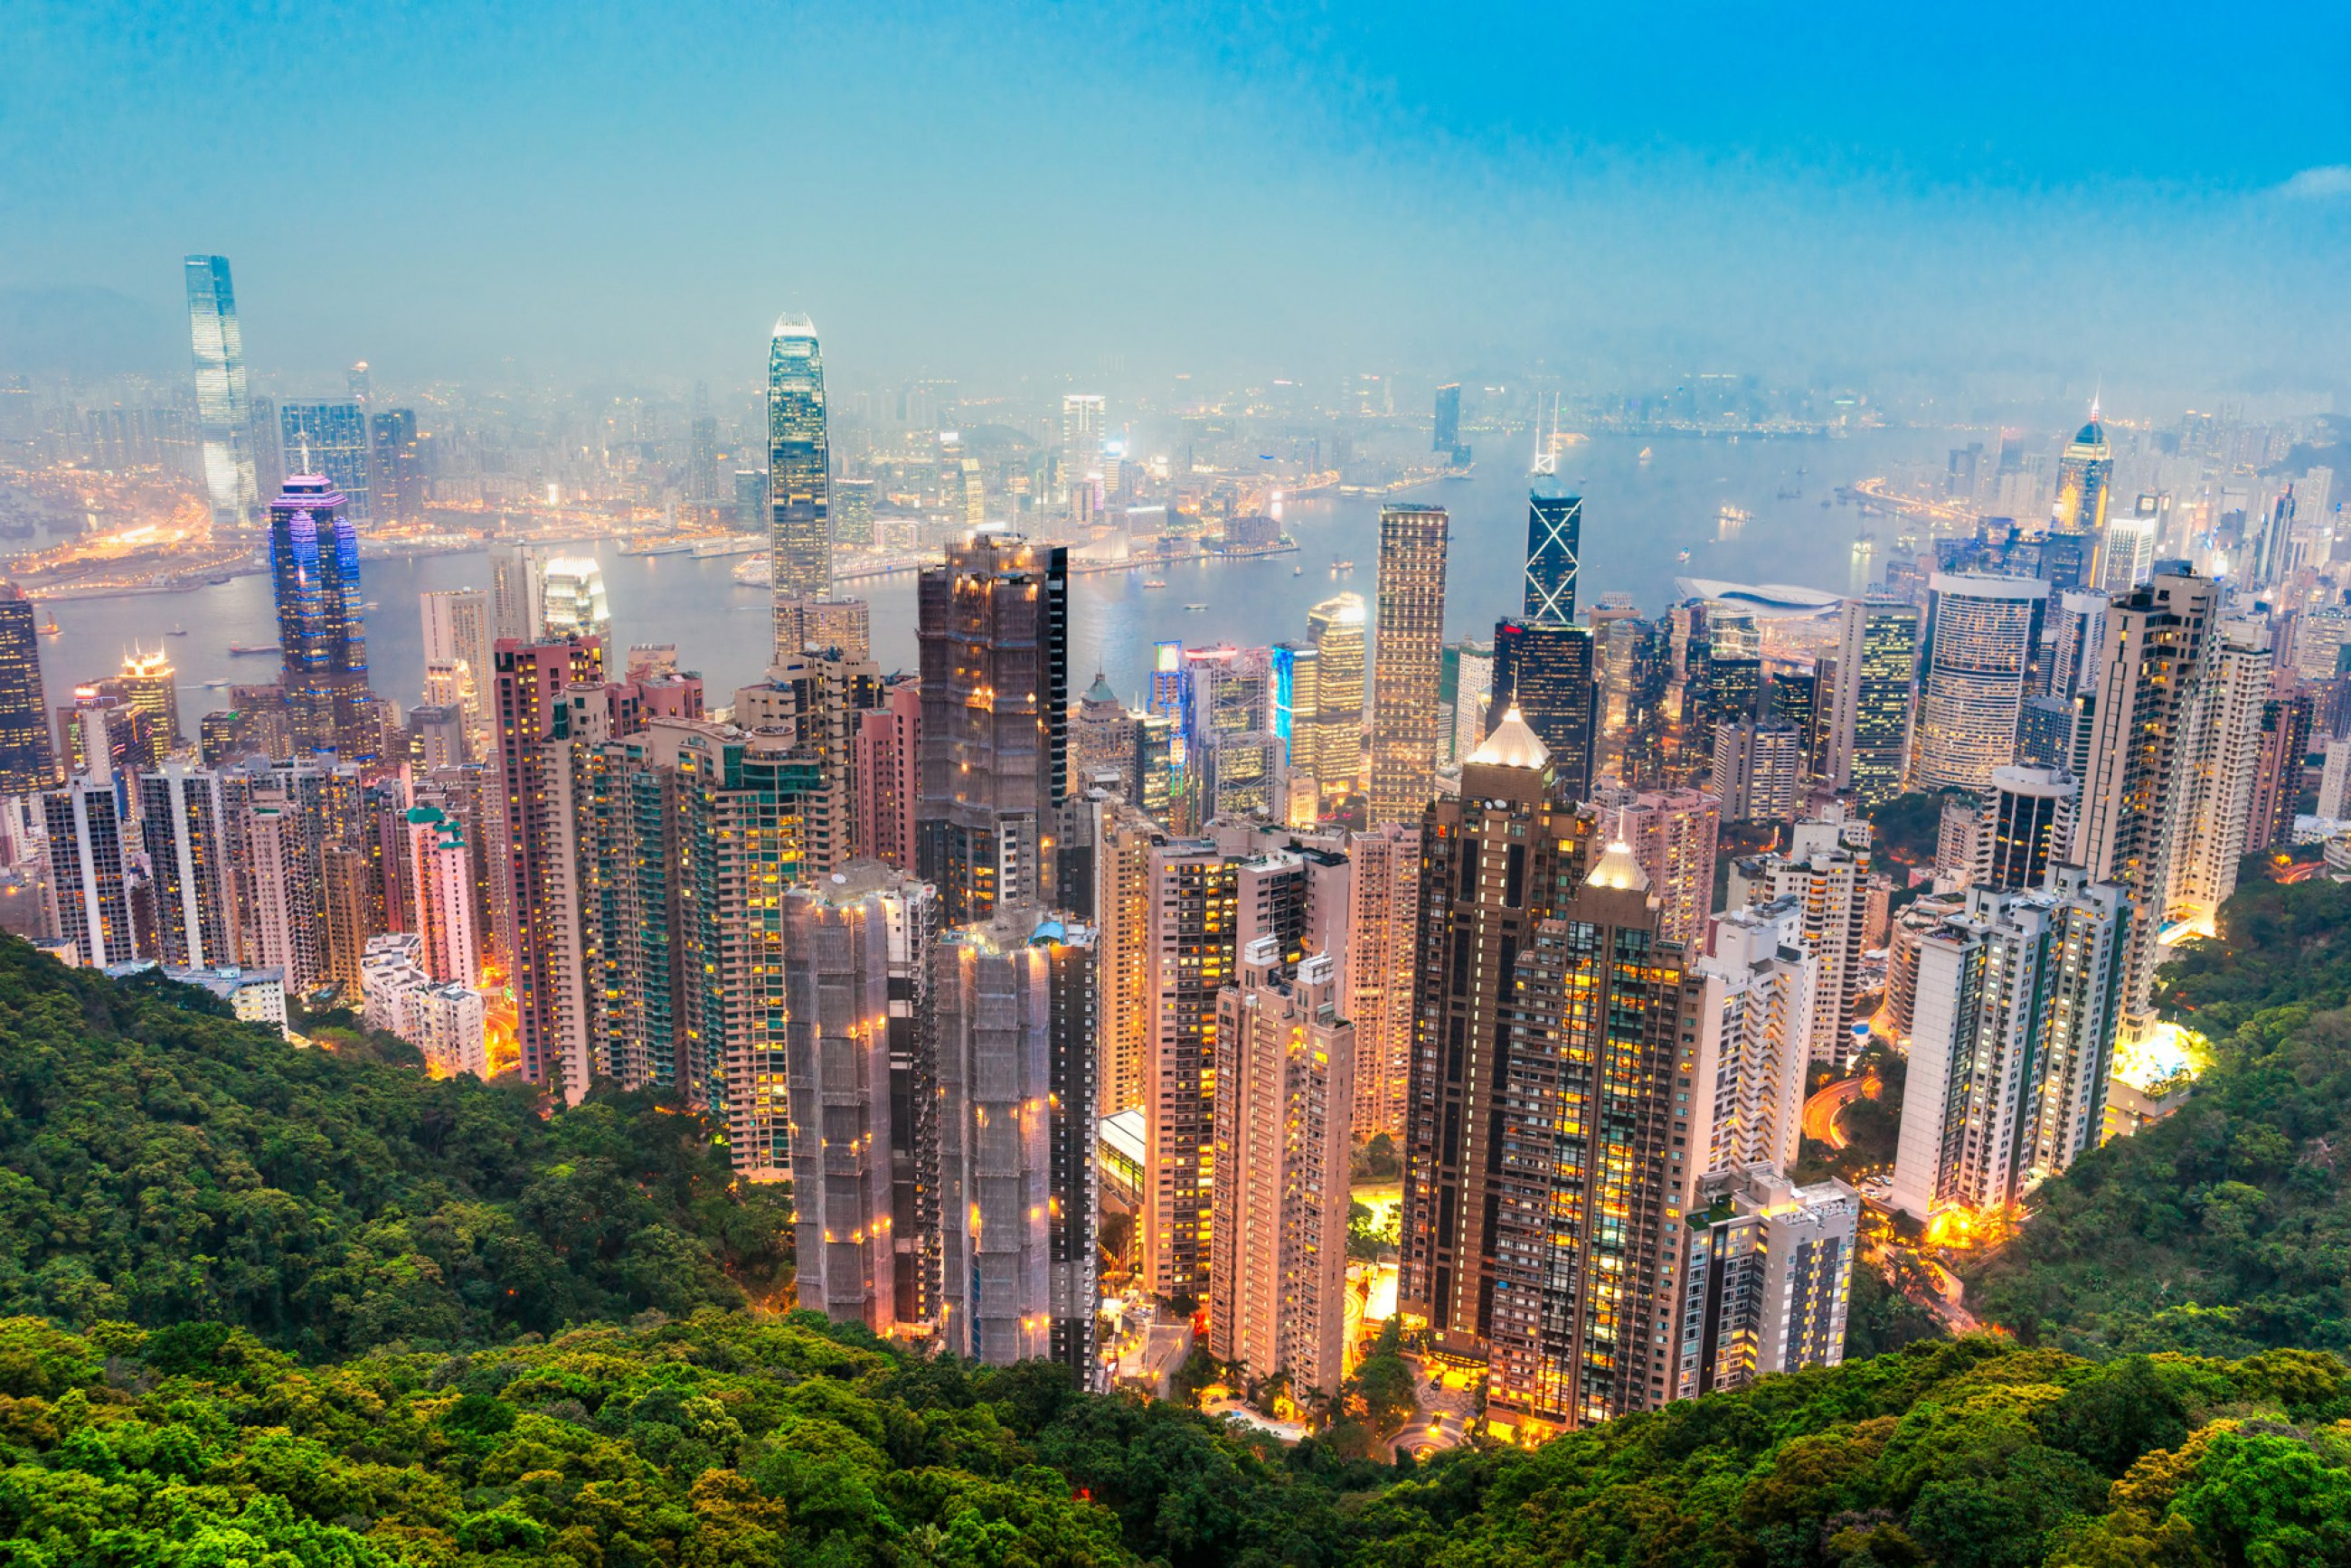 Singapur kresťanskej dátumu lokalít